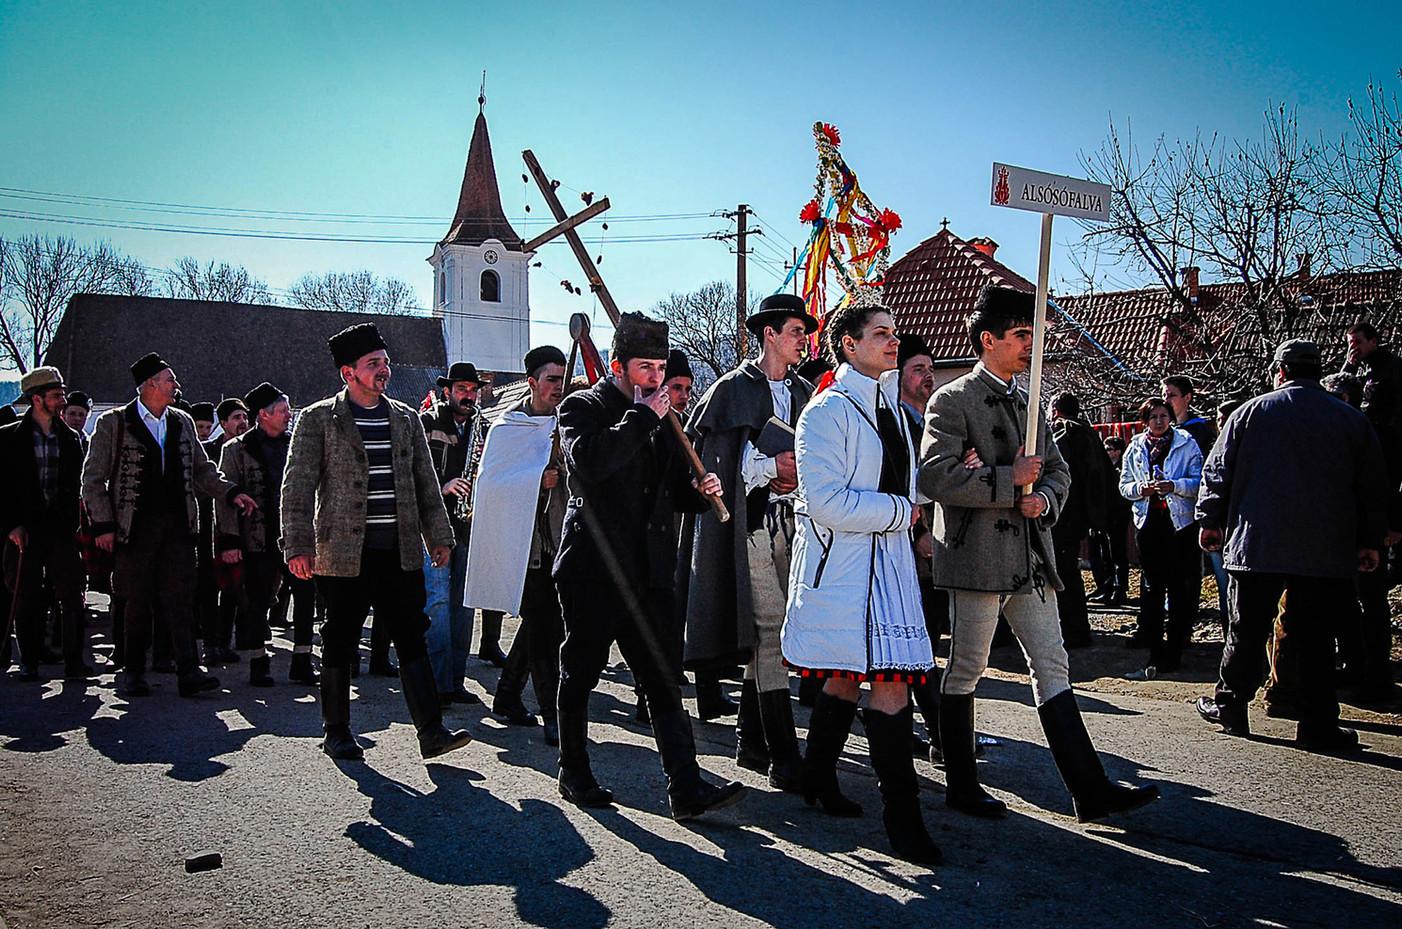 Csíkmenaság / Armășeni Harghita county / Hargita megye / Județul Harghita Romania / Románia / România 2014